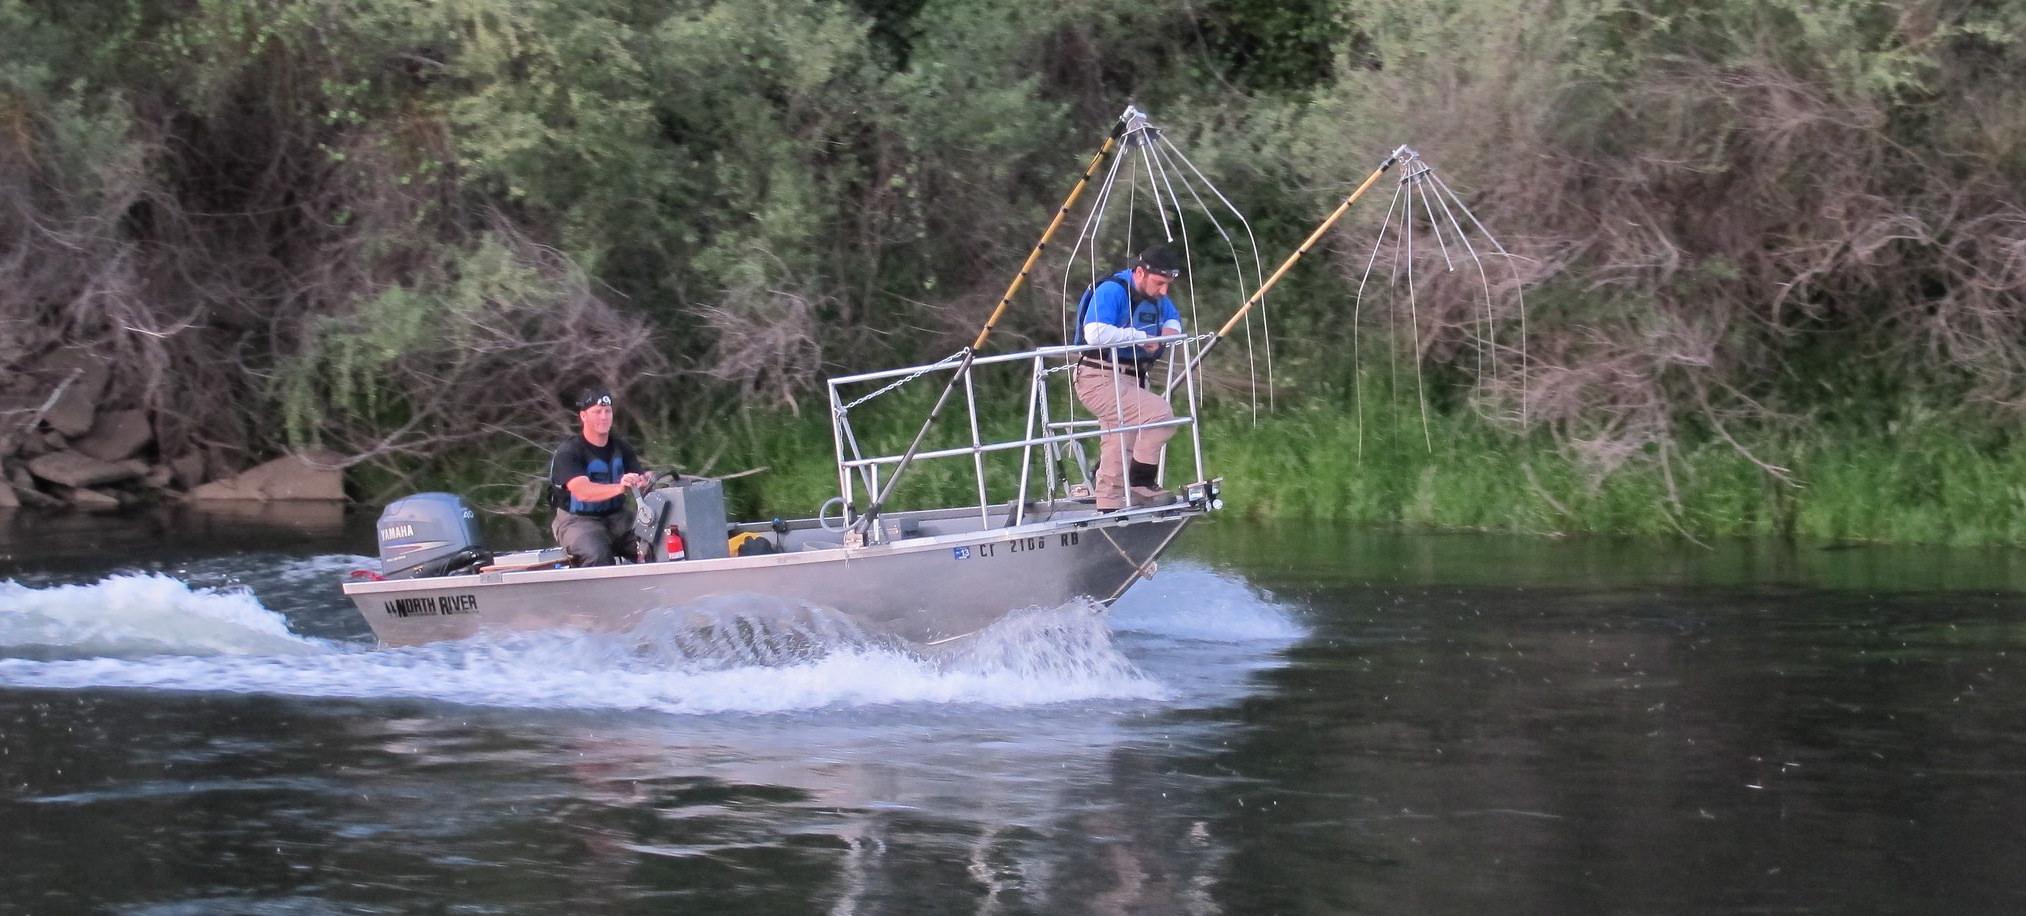 North River electrofishing boat